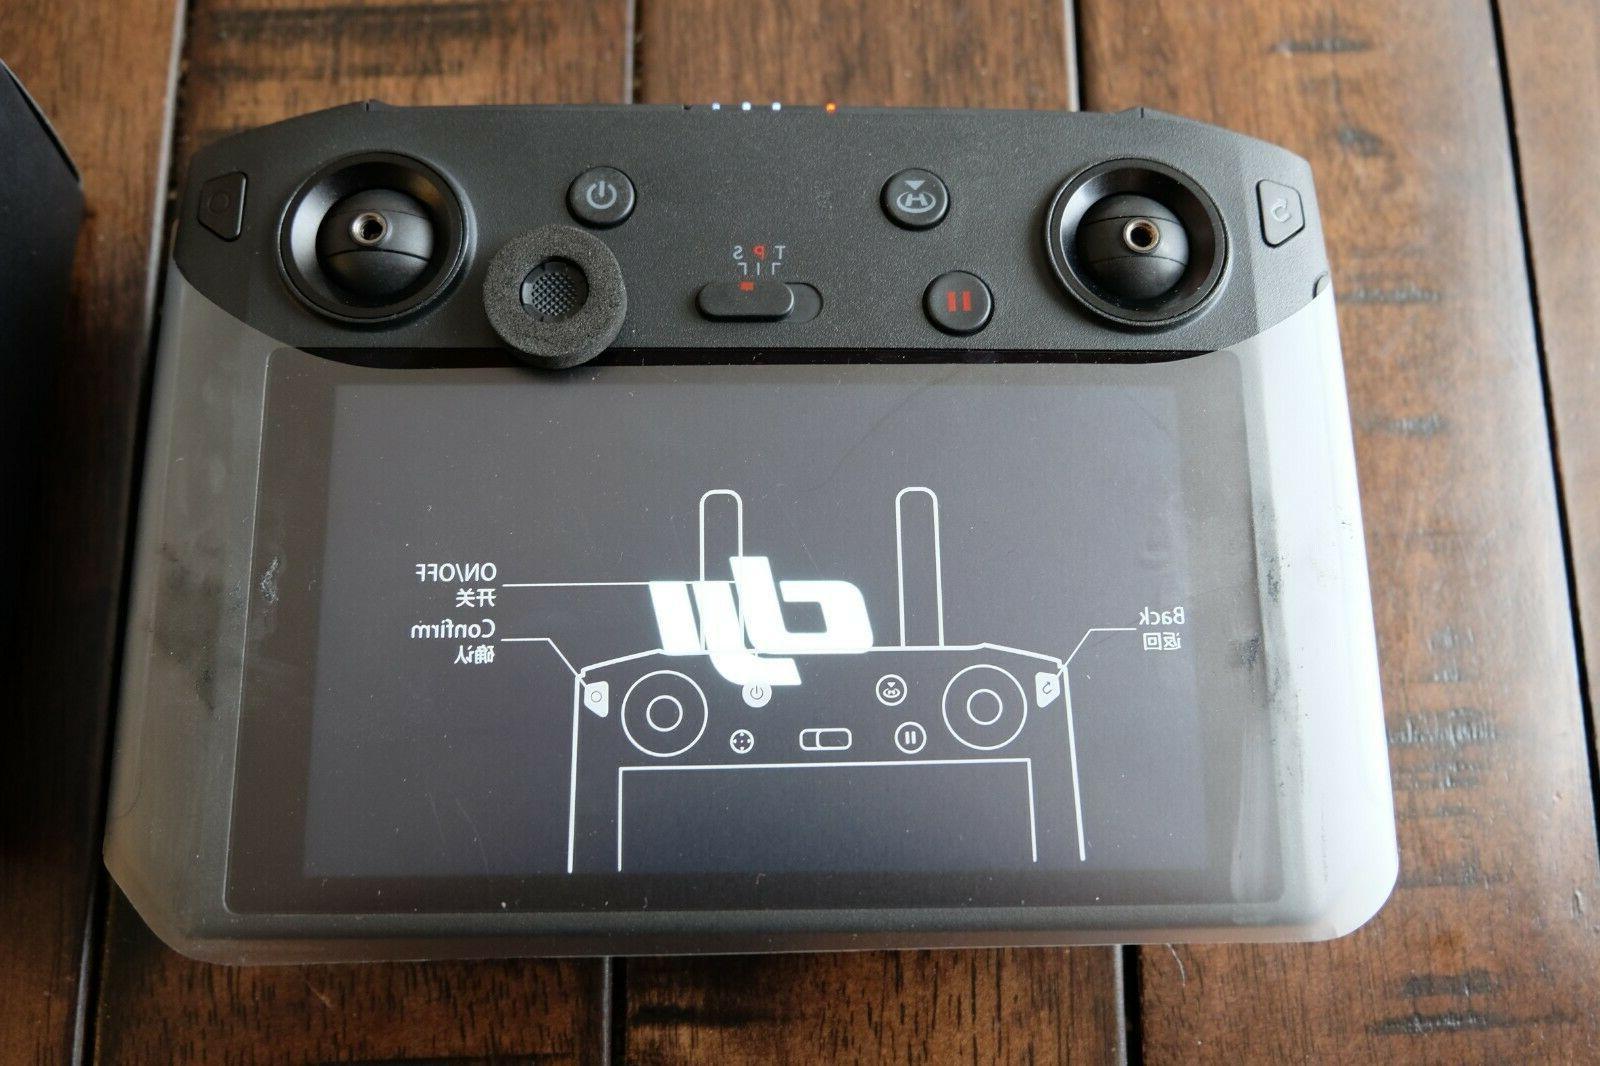 DJI Smart Remote Controller 5.5-inch 1080P Display for Mavic 2 Pro/Zoom